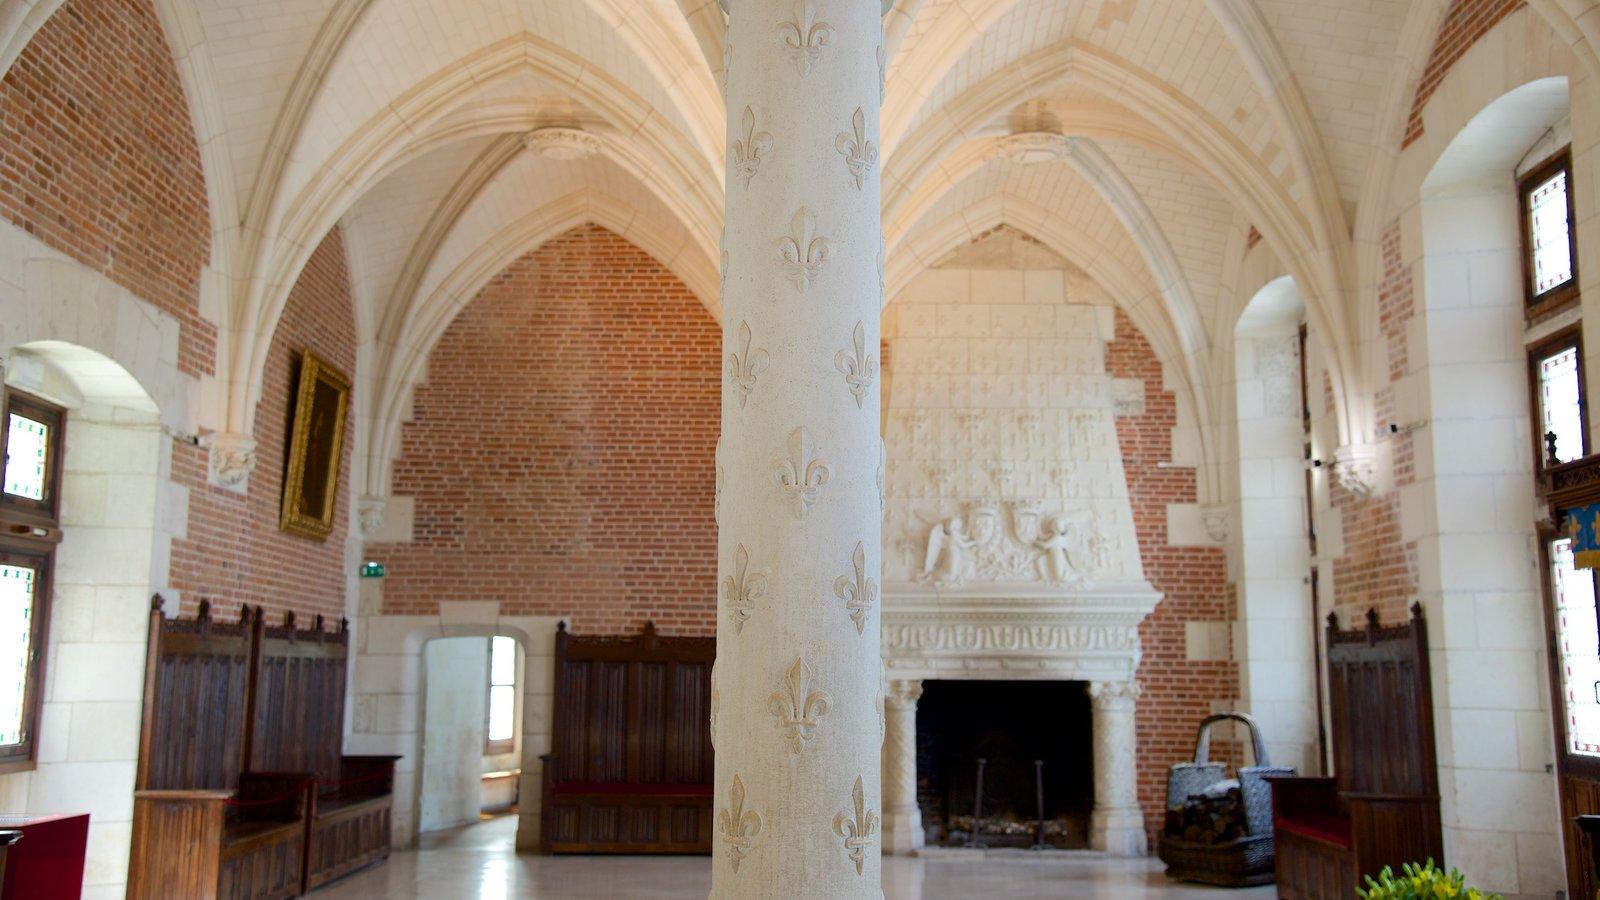 Chateau d\'Amboise caracterizando um castelo e vistas internas